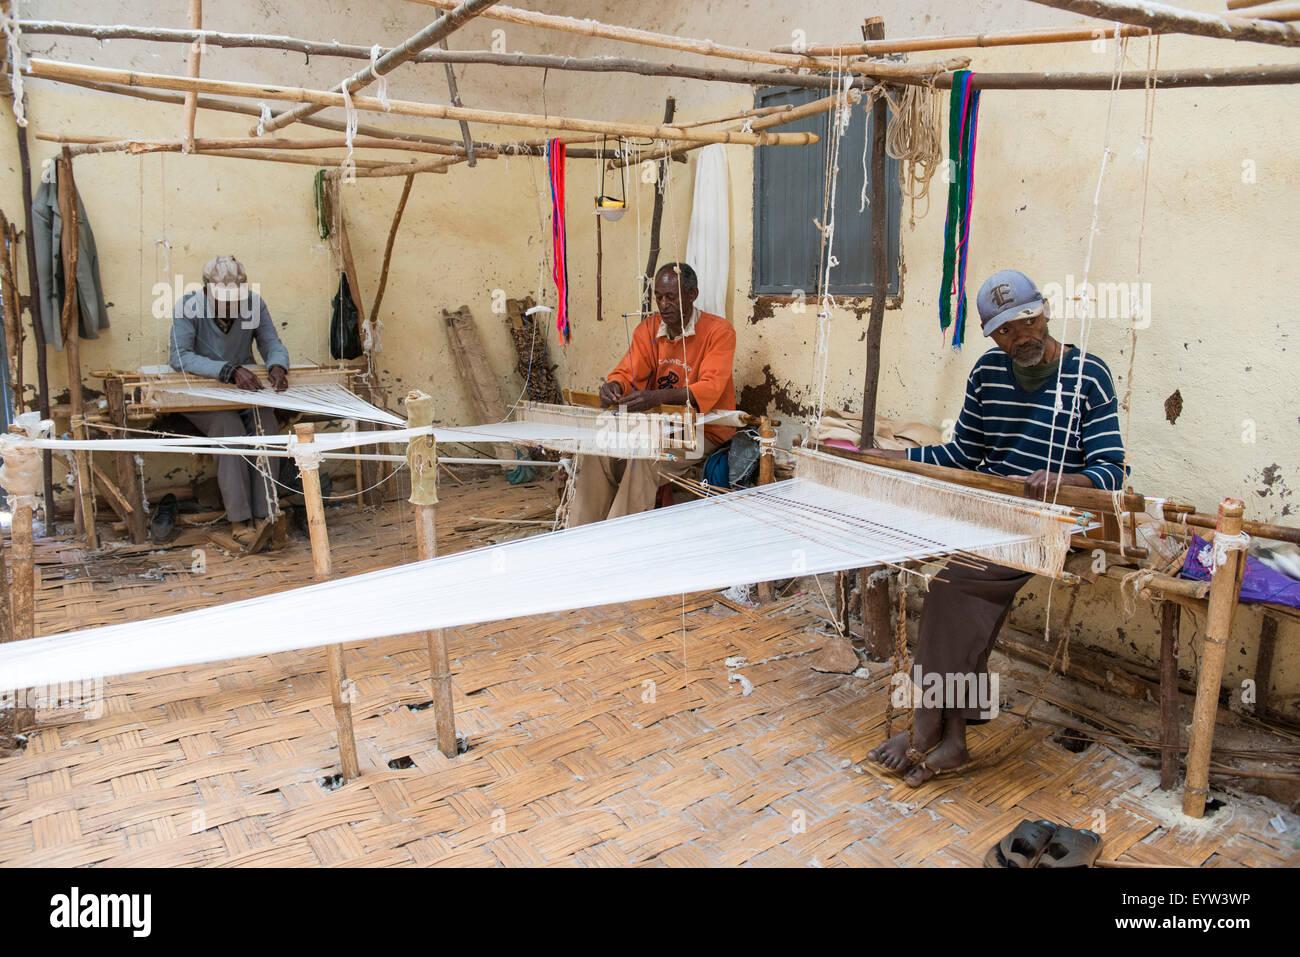 Traditional cotton weavers, Dorze, Ethiopia - Stock Image